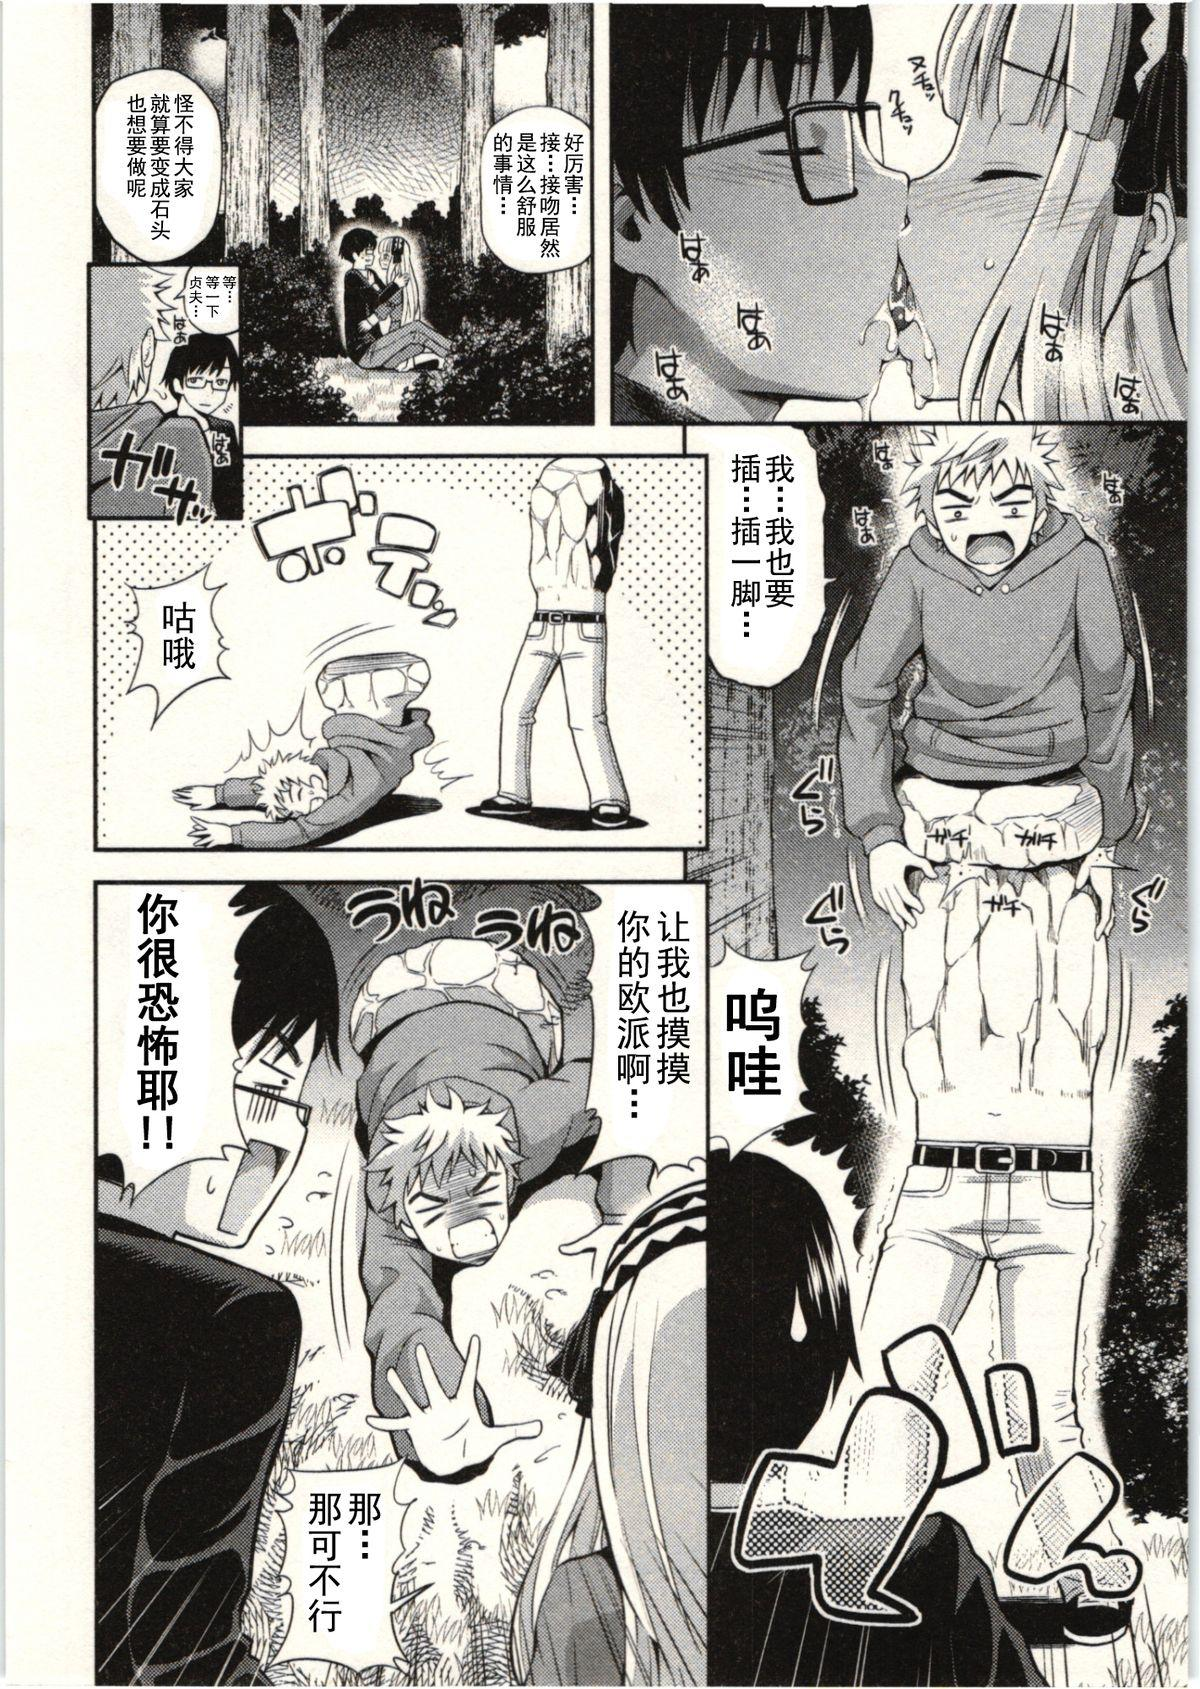 Tadashii Majutsu no Asobikata - The right way of playing of magic. 132